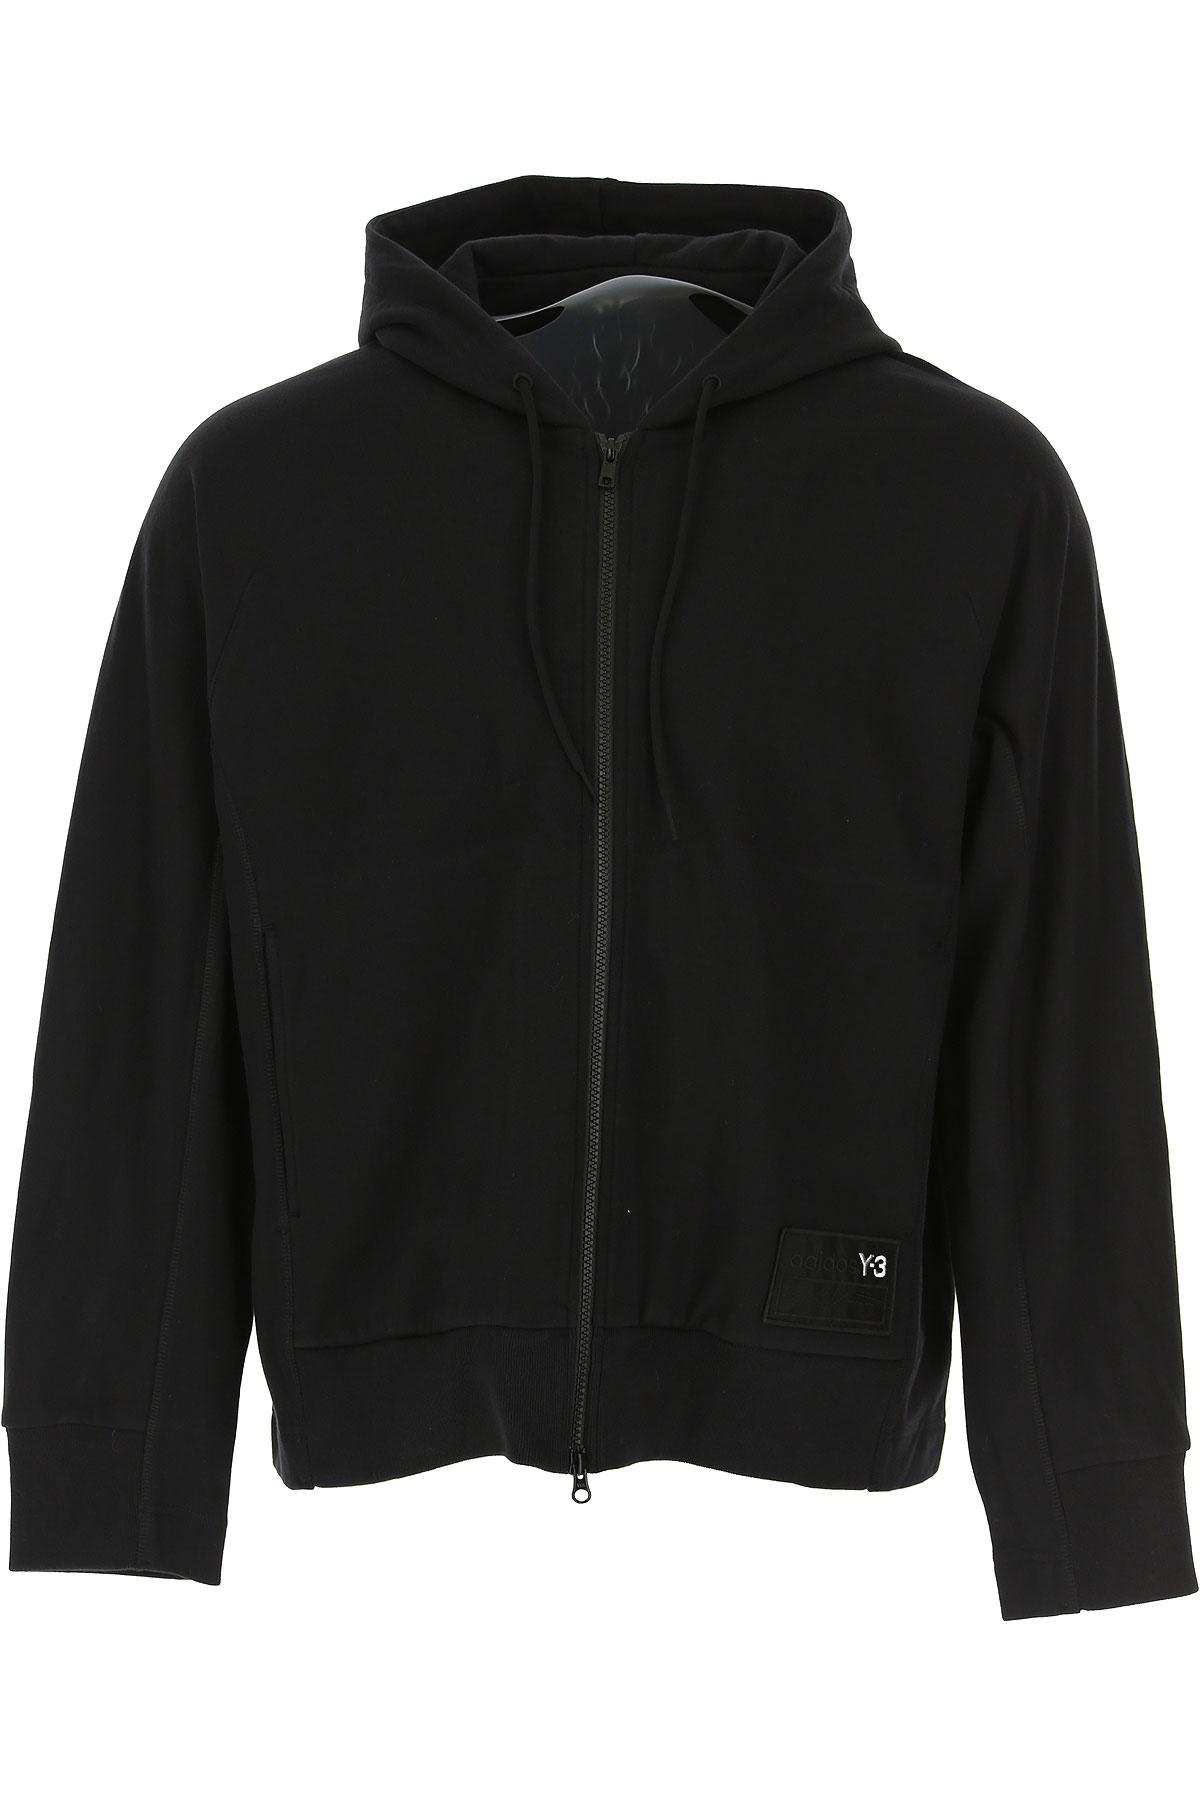 Y3 by Yohji Yamamoto Sweatshirt for Men On Sale, Black, Cotton, 2019, L S